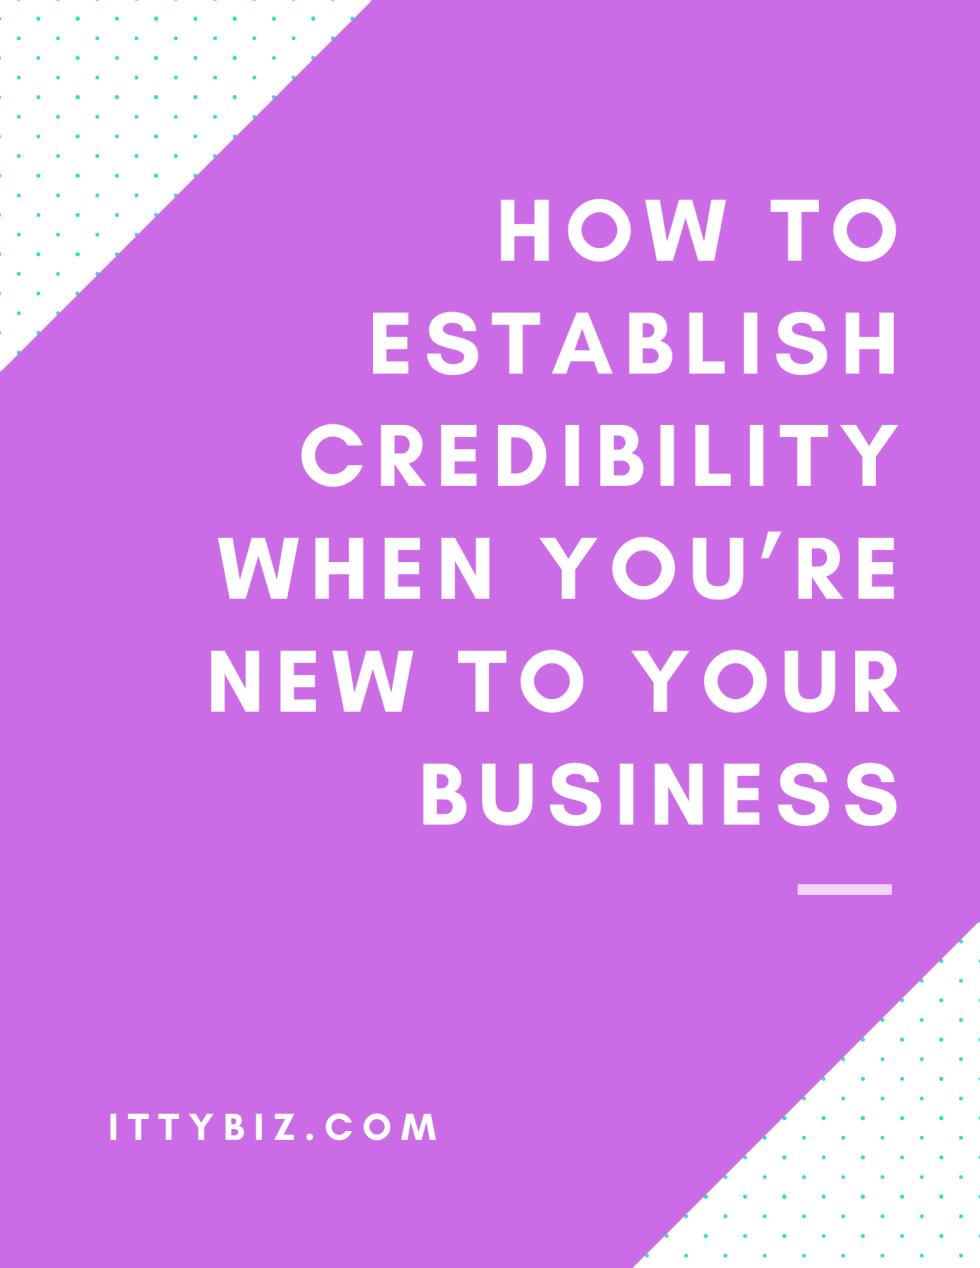 establishing-credibility